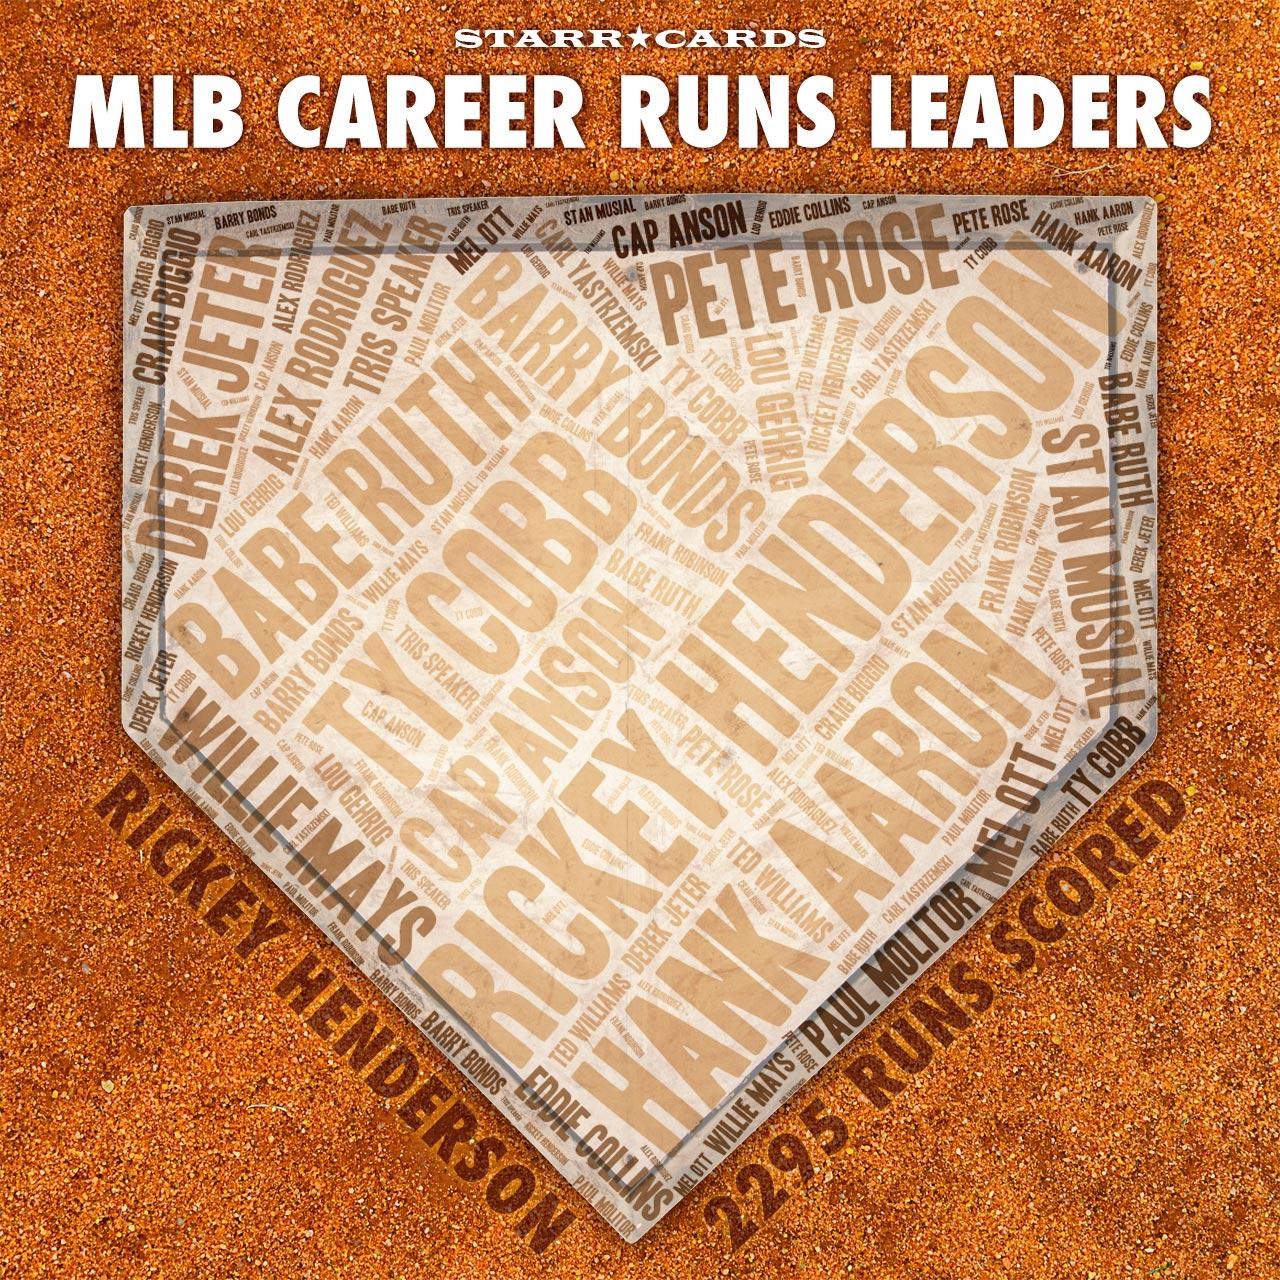 Starr Cards Infographic: MLB Career Runs Scored Leaders